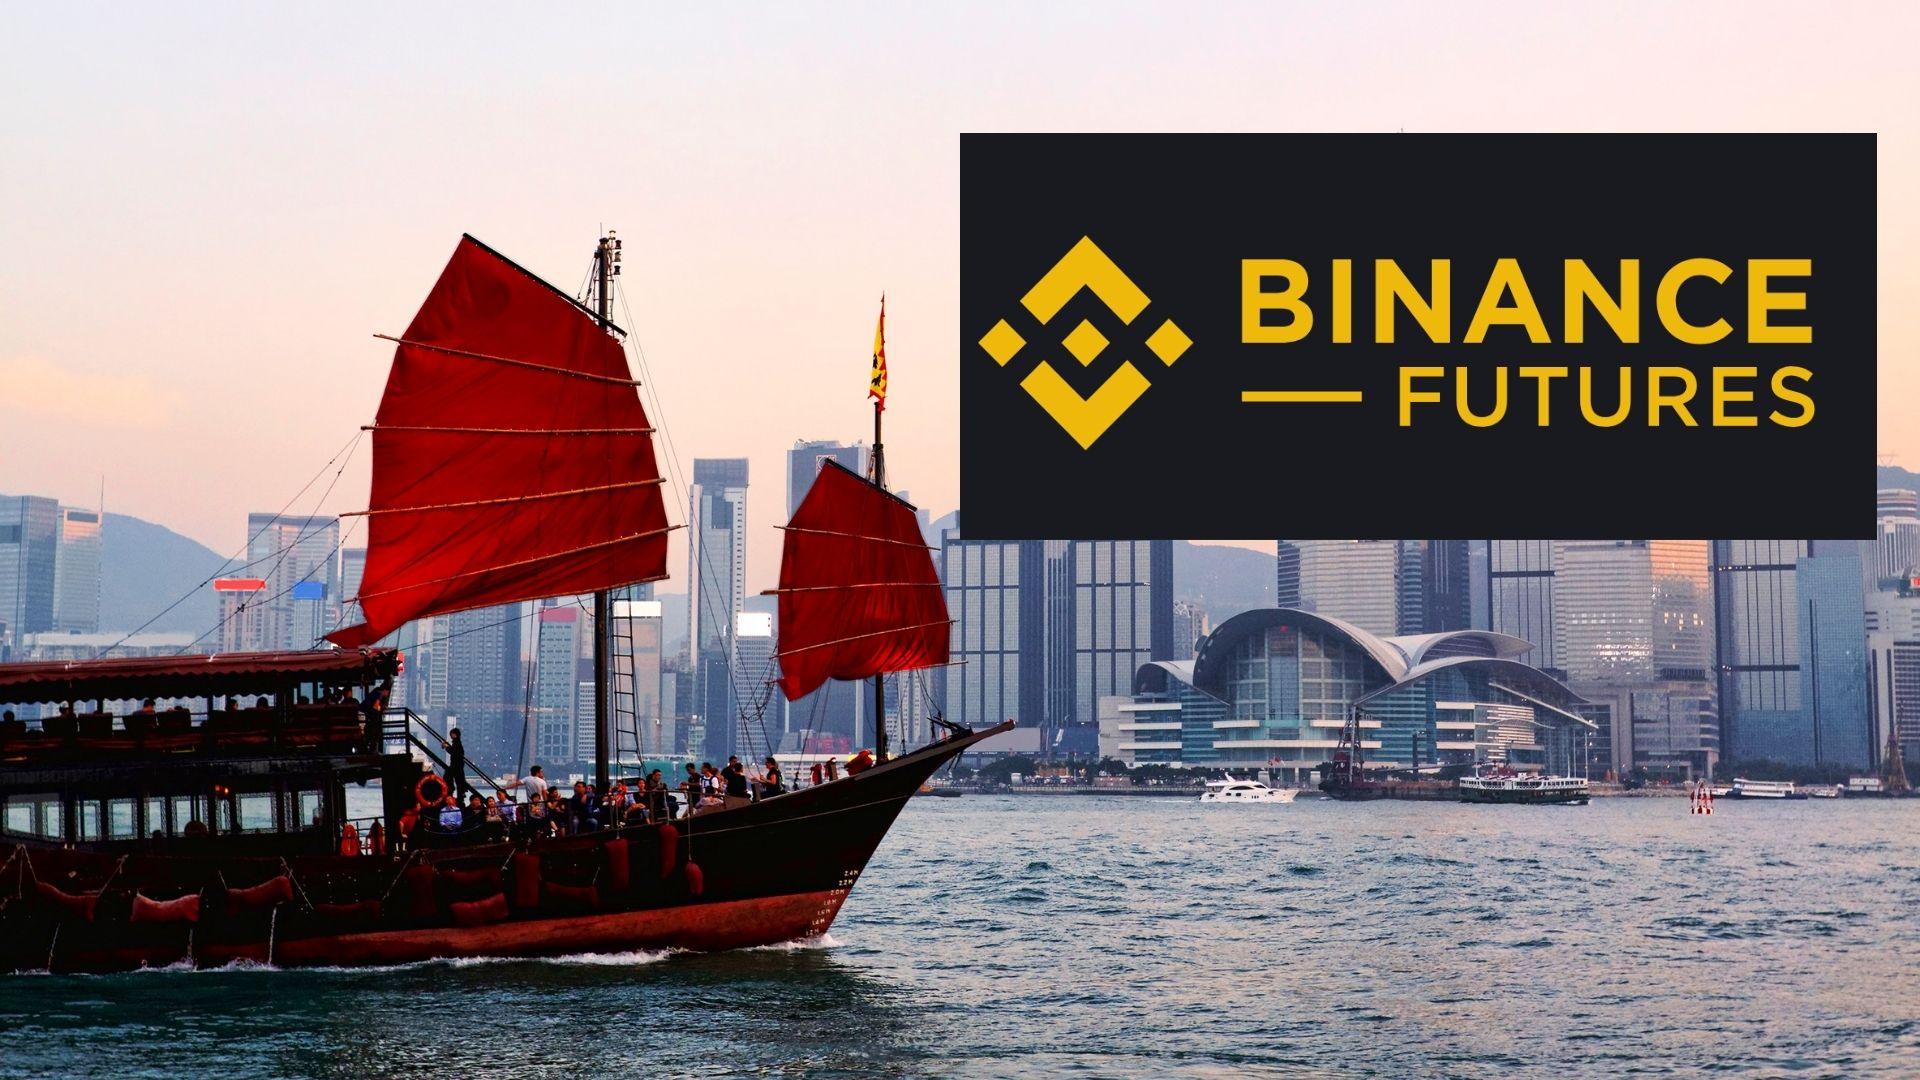 commercio di crypto hong kong è la legit bitcoin trader